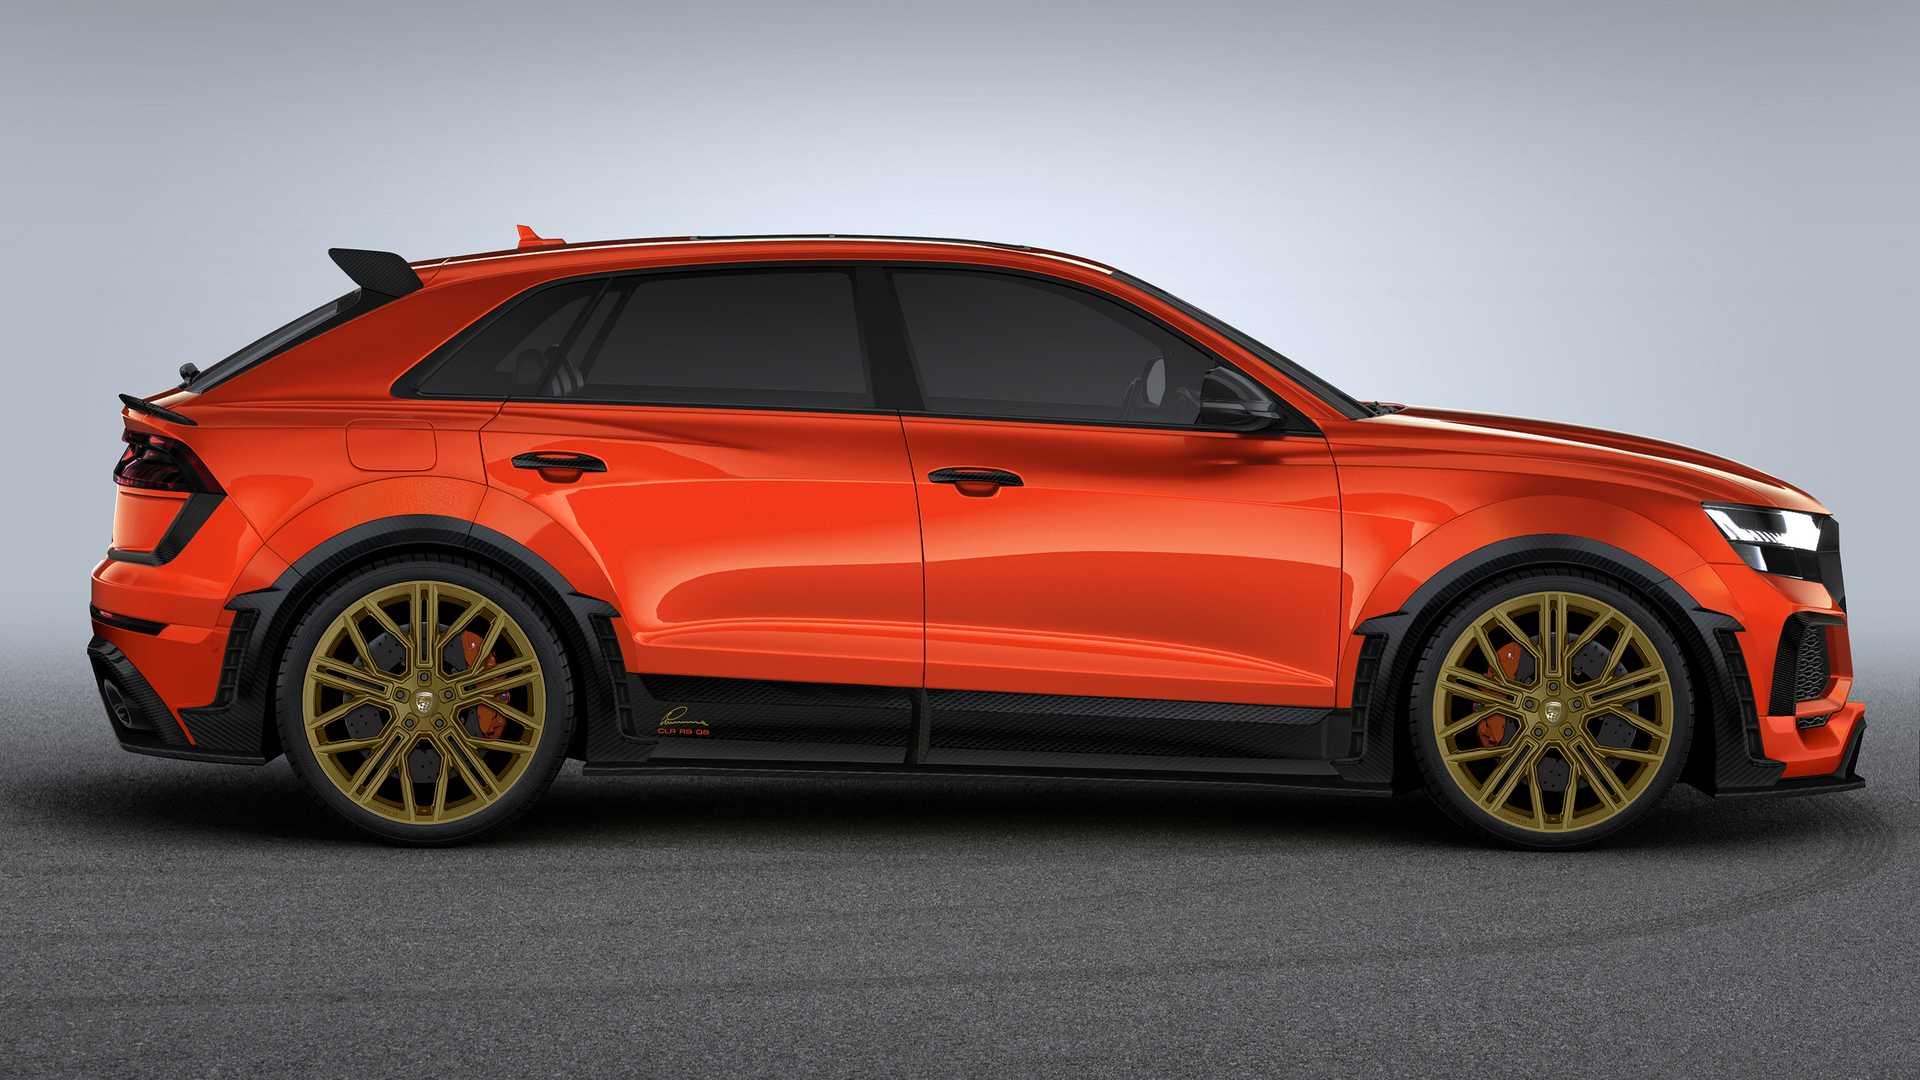 Audi-RS-Q8-CLR-8-RS-By-Lumma-Design-14